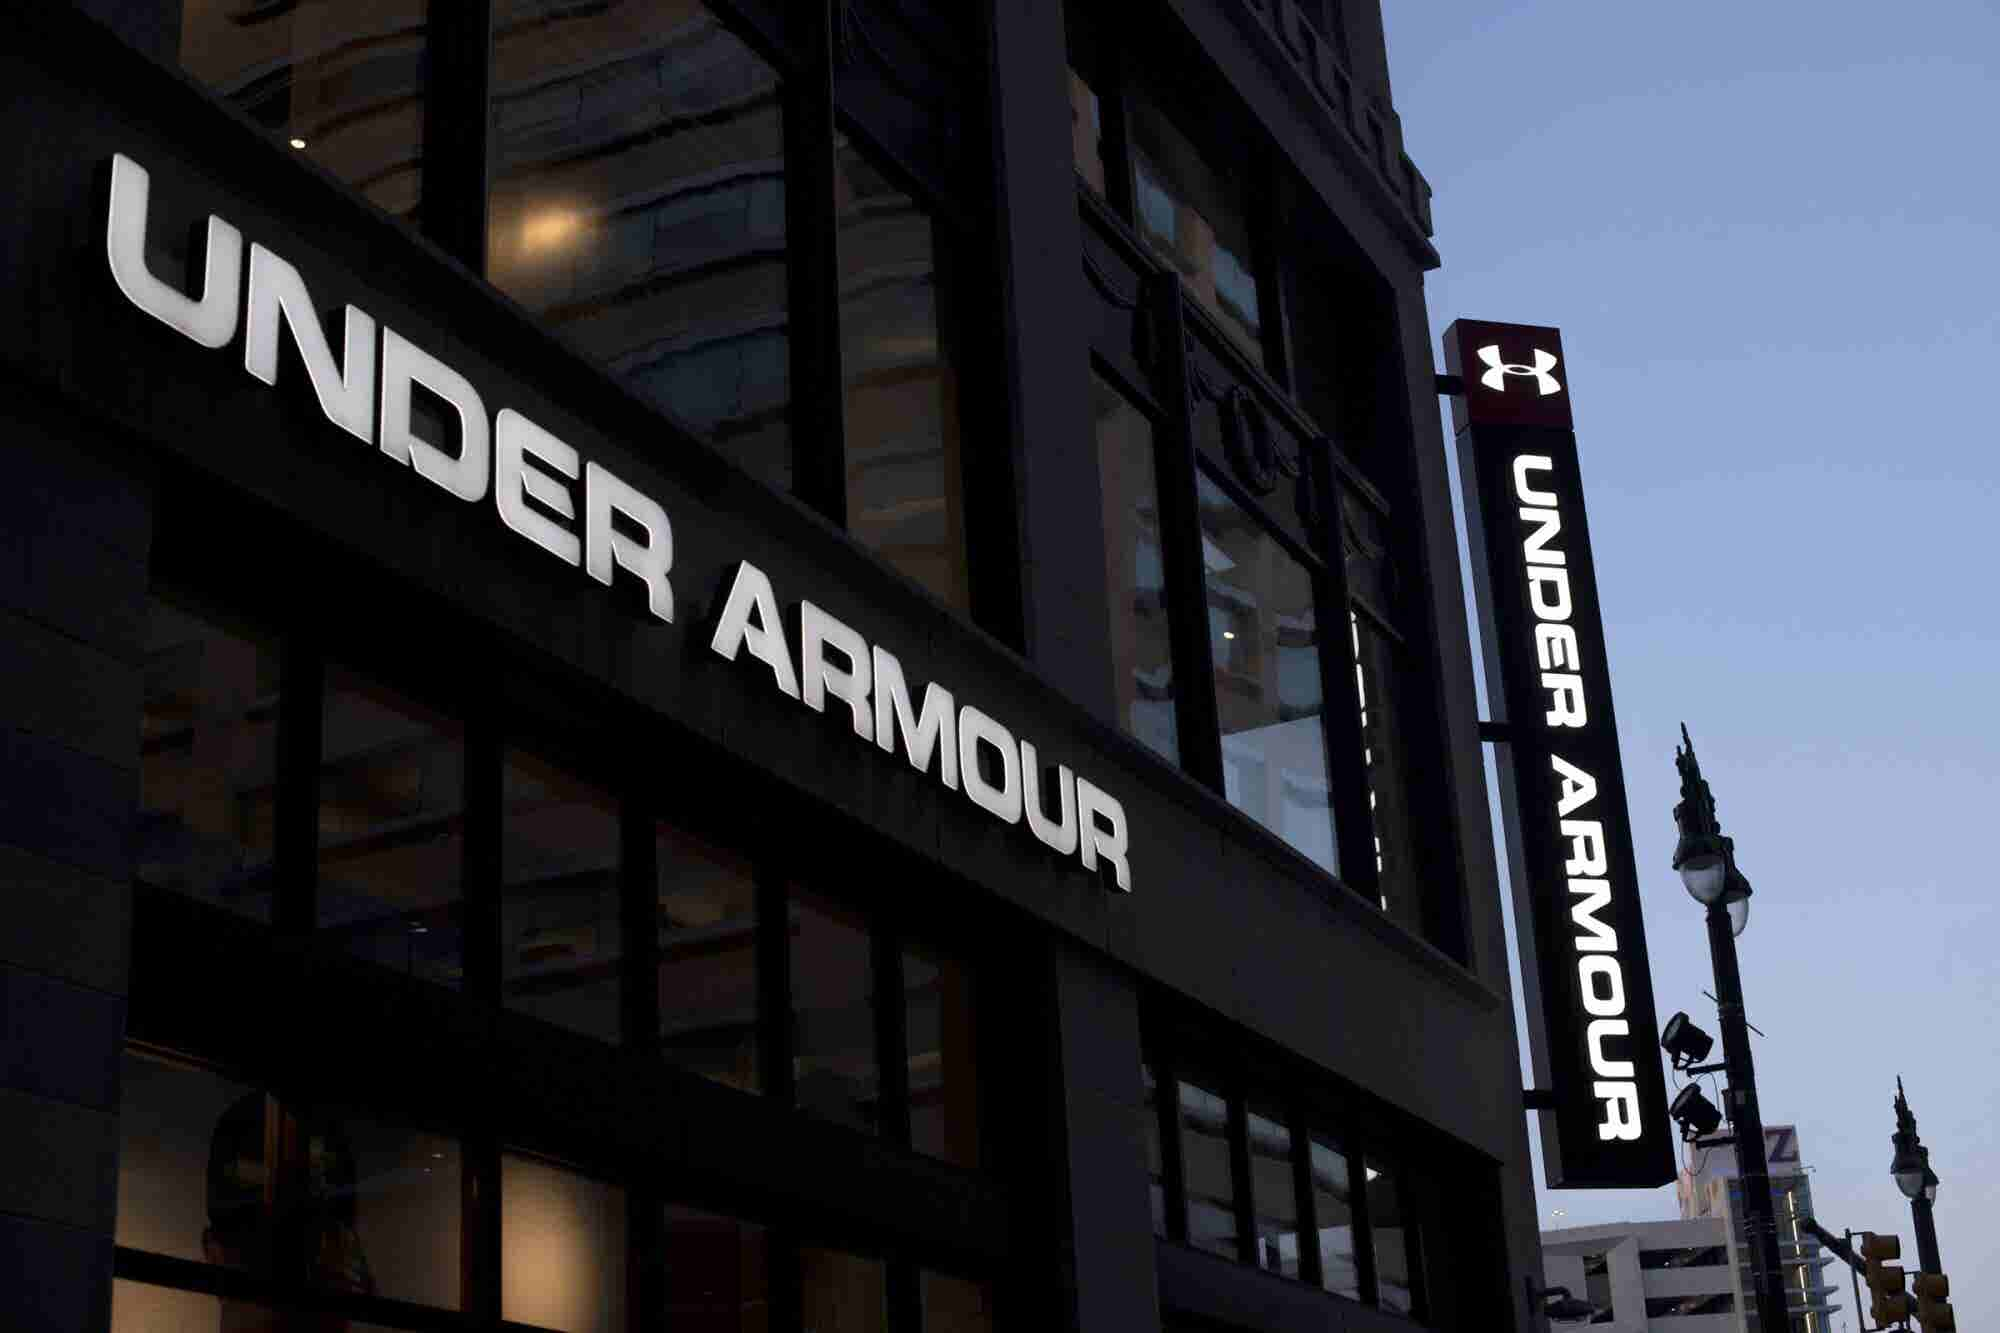 Entrepreneur Index™ Rises as Fears of Trade War Dissipate